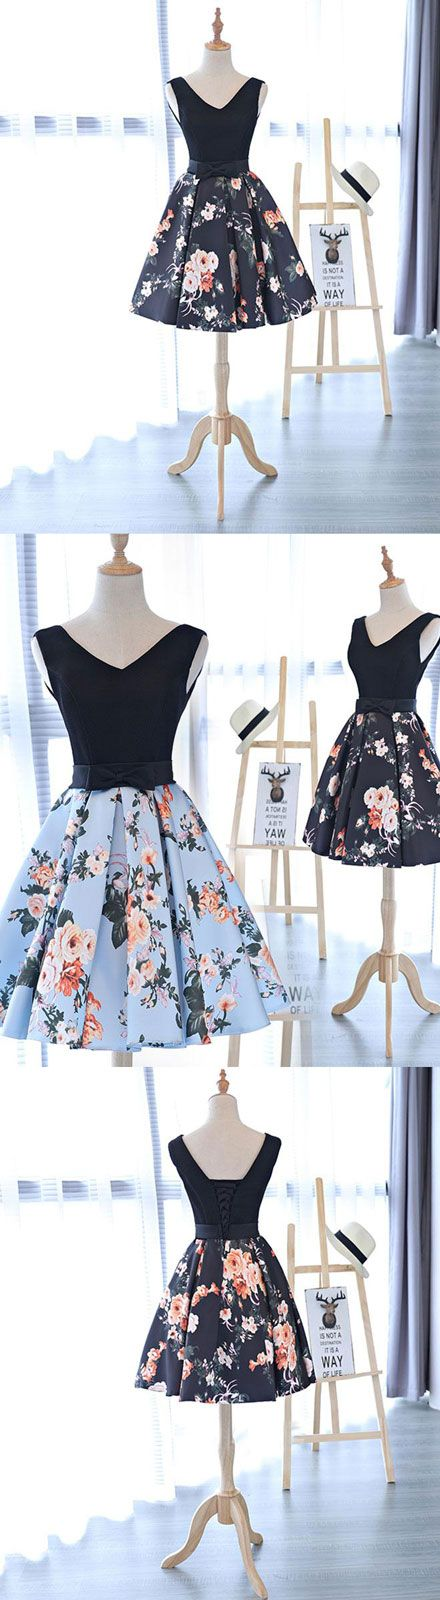 Cute v neck floral pattern short prom dress, homecoming dress ...